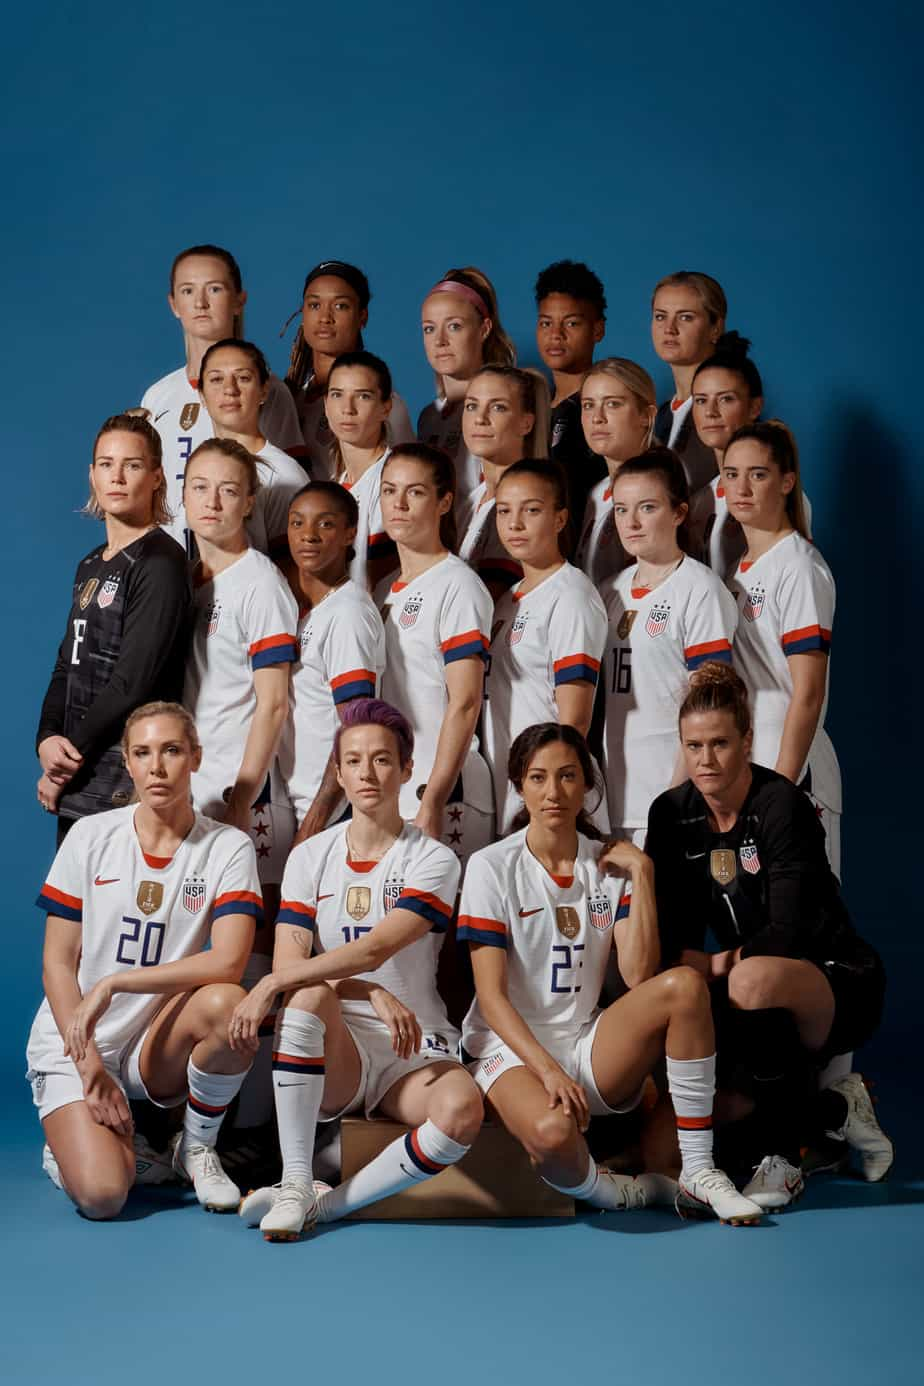 soccer women most popular sports America